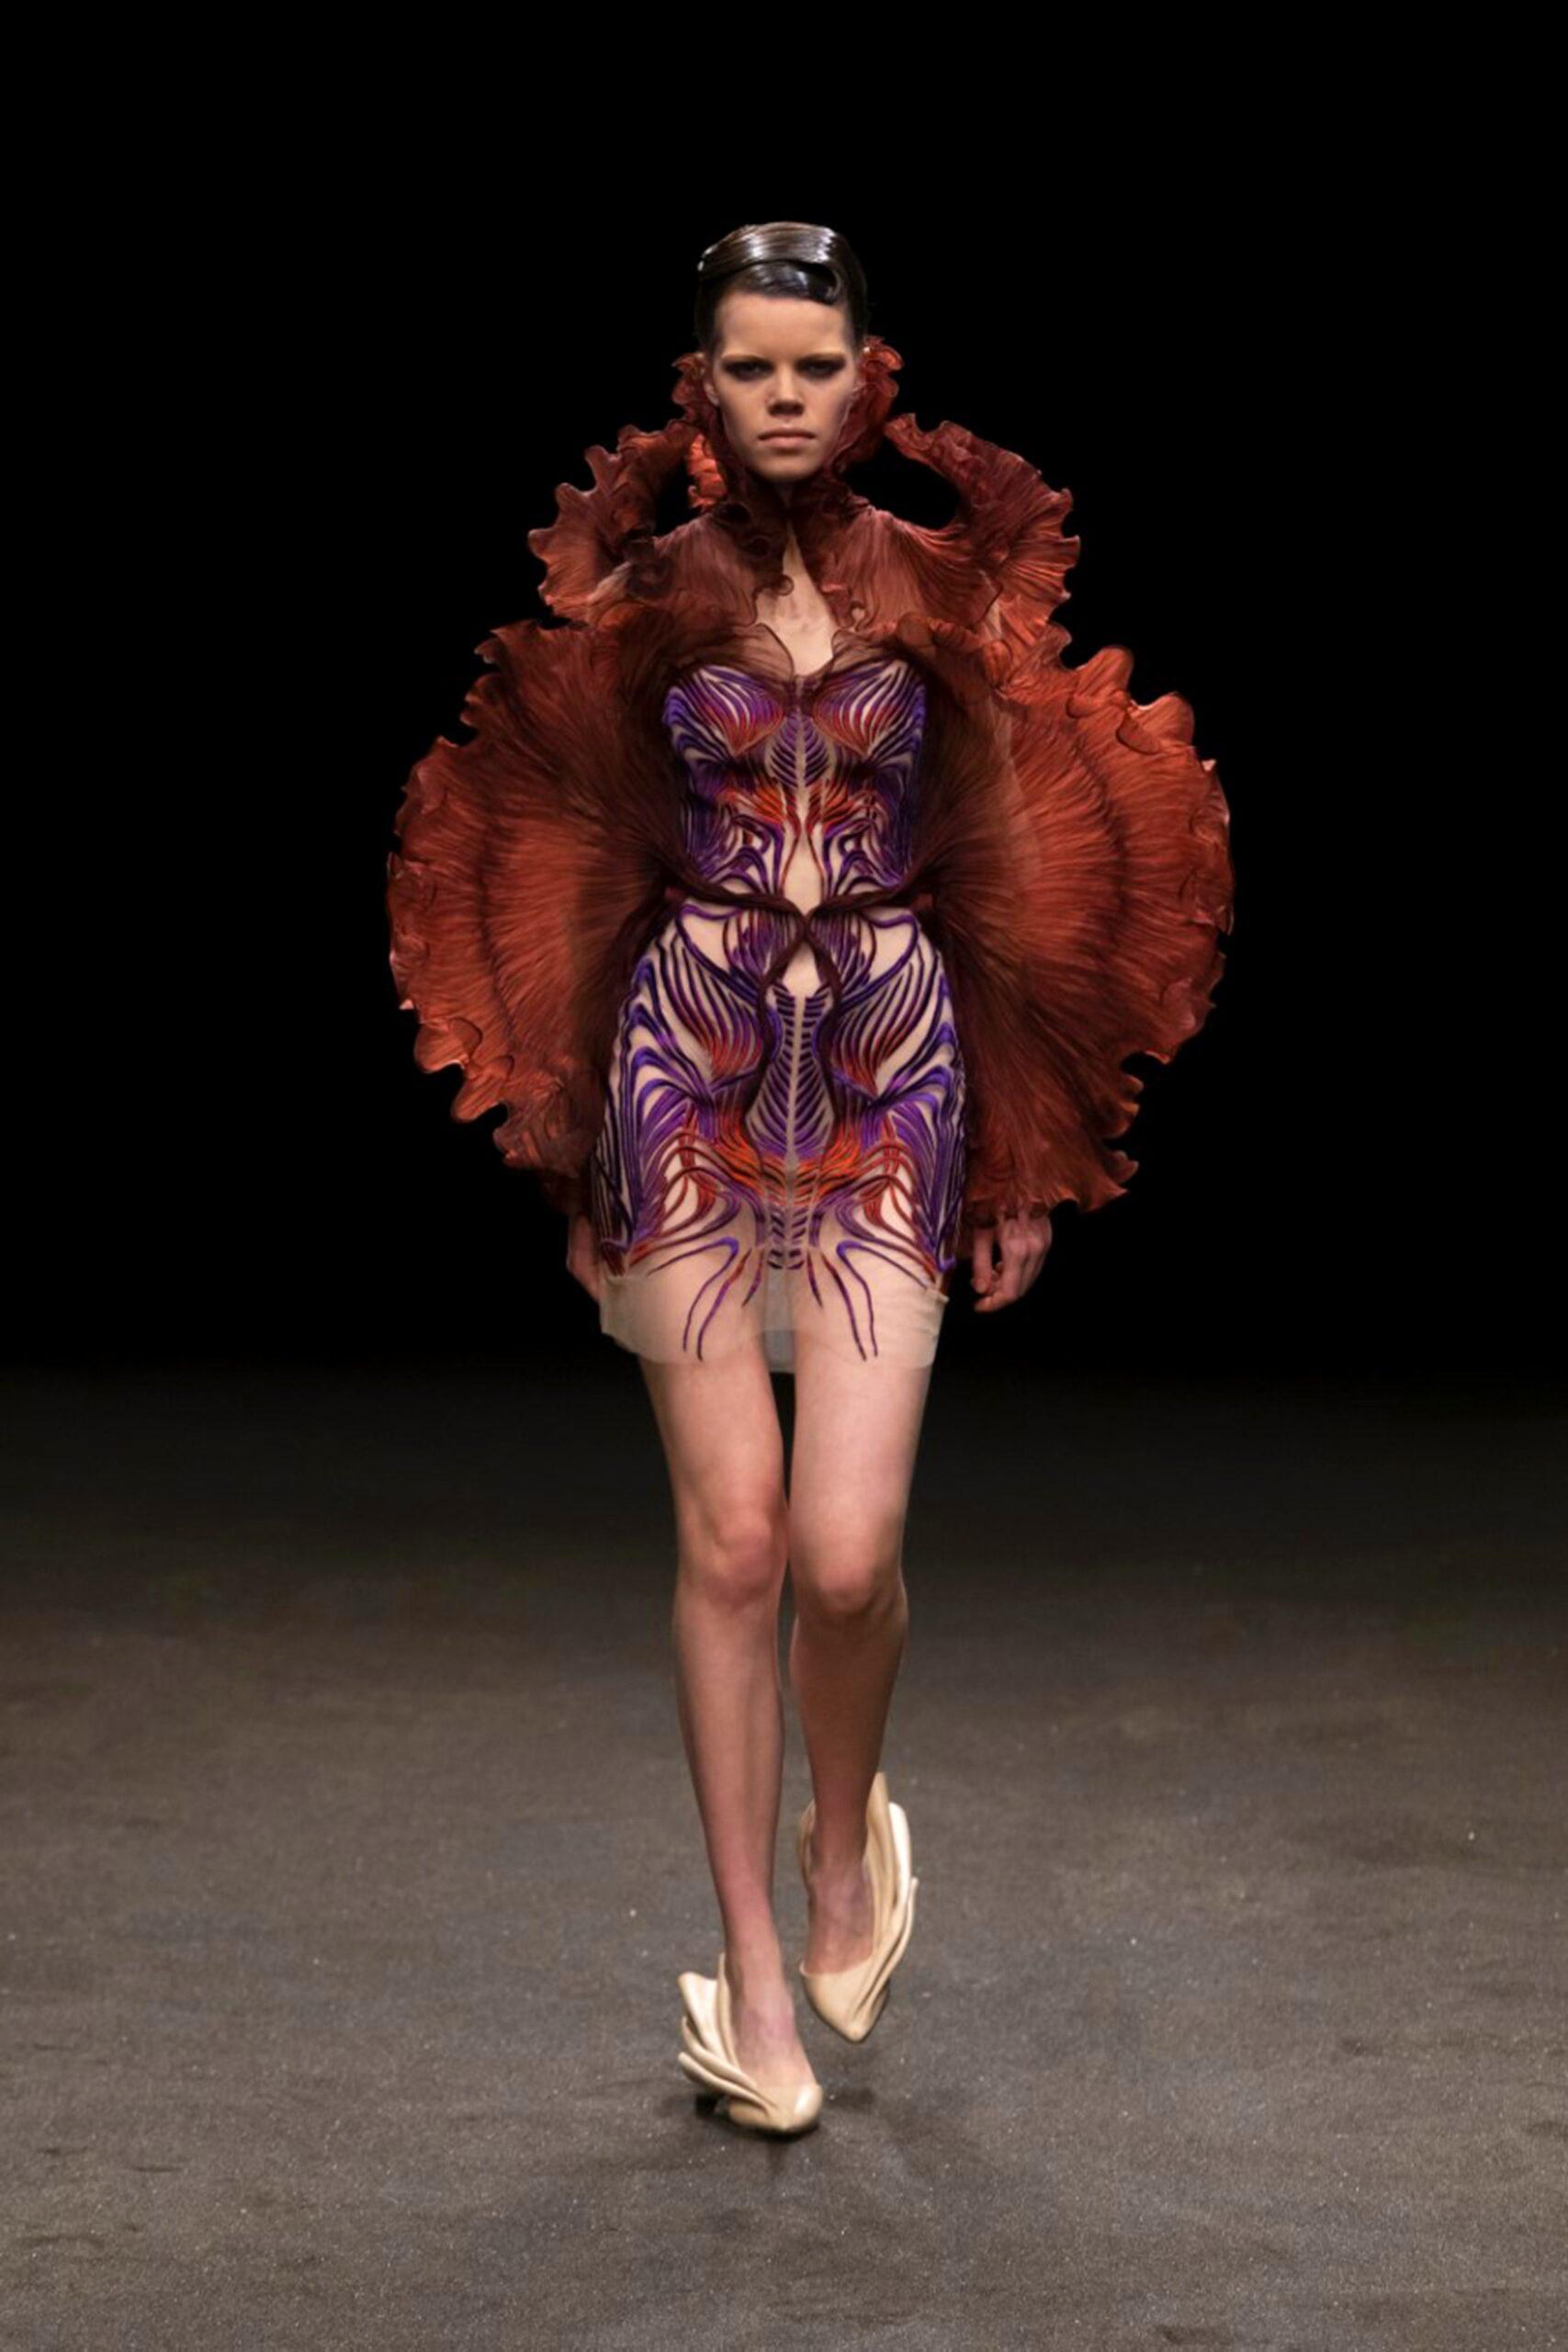 00005 Iris van Herpen Couture Spring 21 credit Gio Staiano